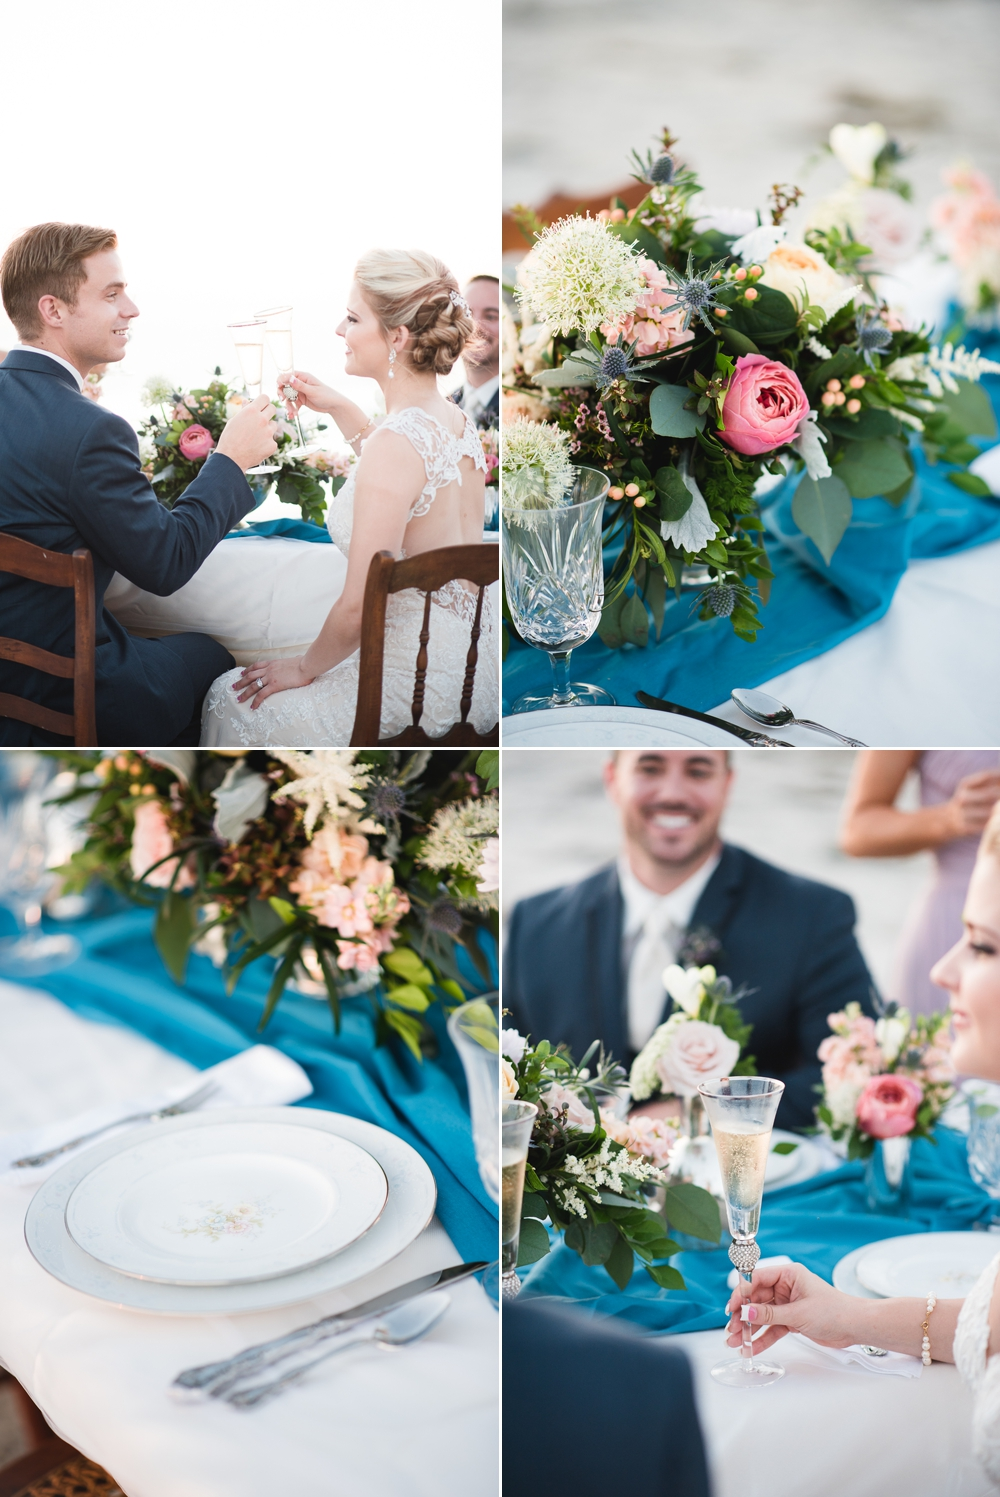 2016 HLM Wedding Beach Shoot 20.jpg